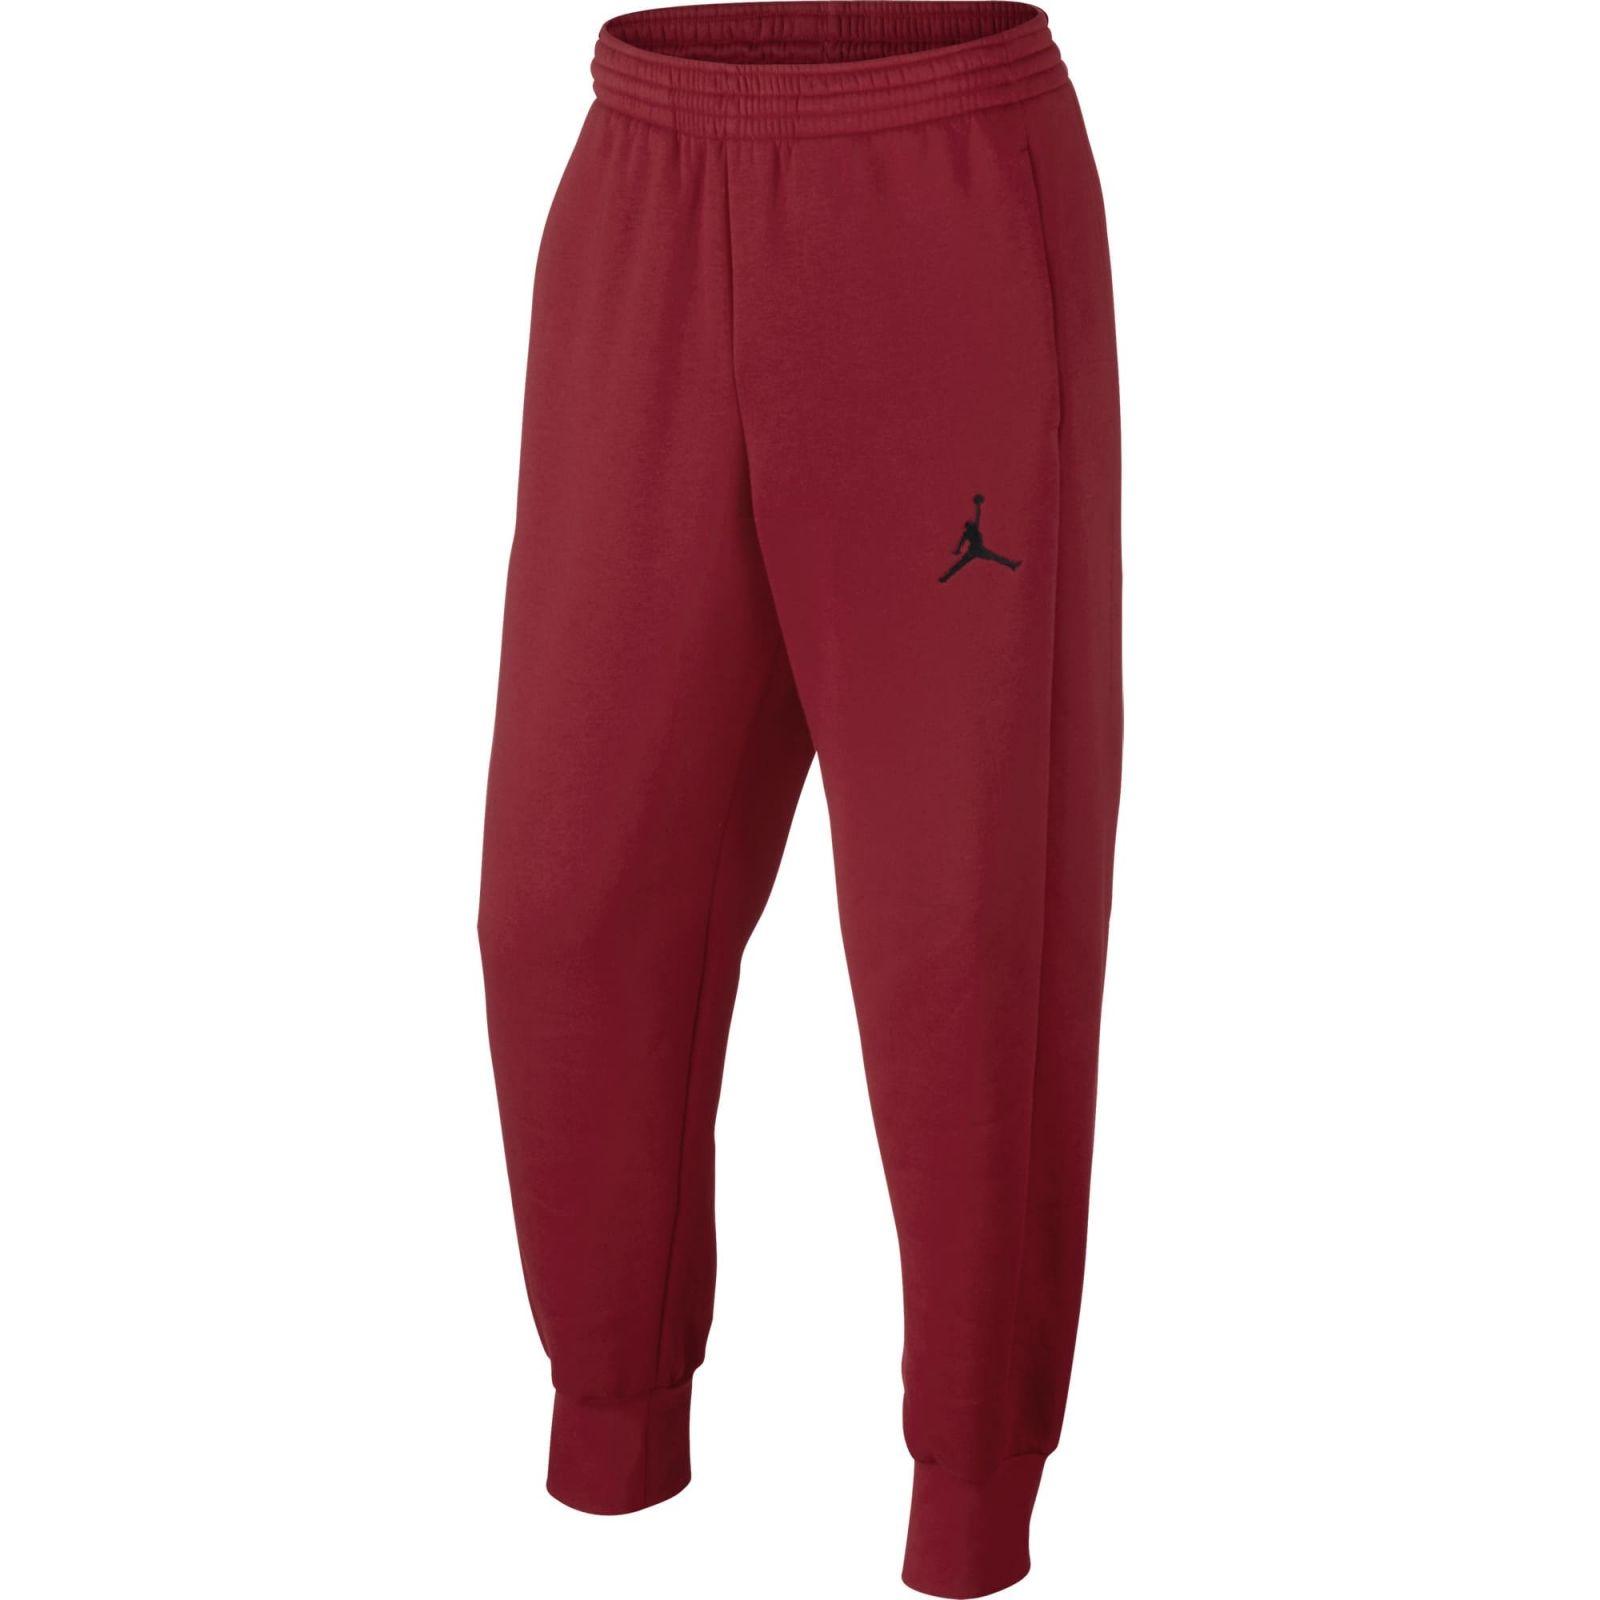 Pantalon Largo Jordan Flight Rojo 2 Ropa Deportiva Para Hombre Pantalon Largo Pantalones